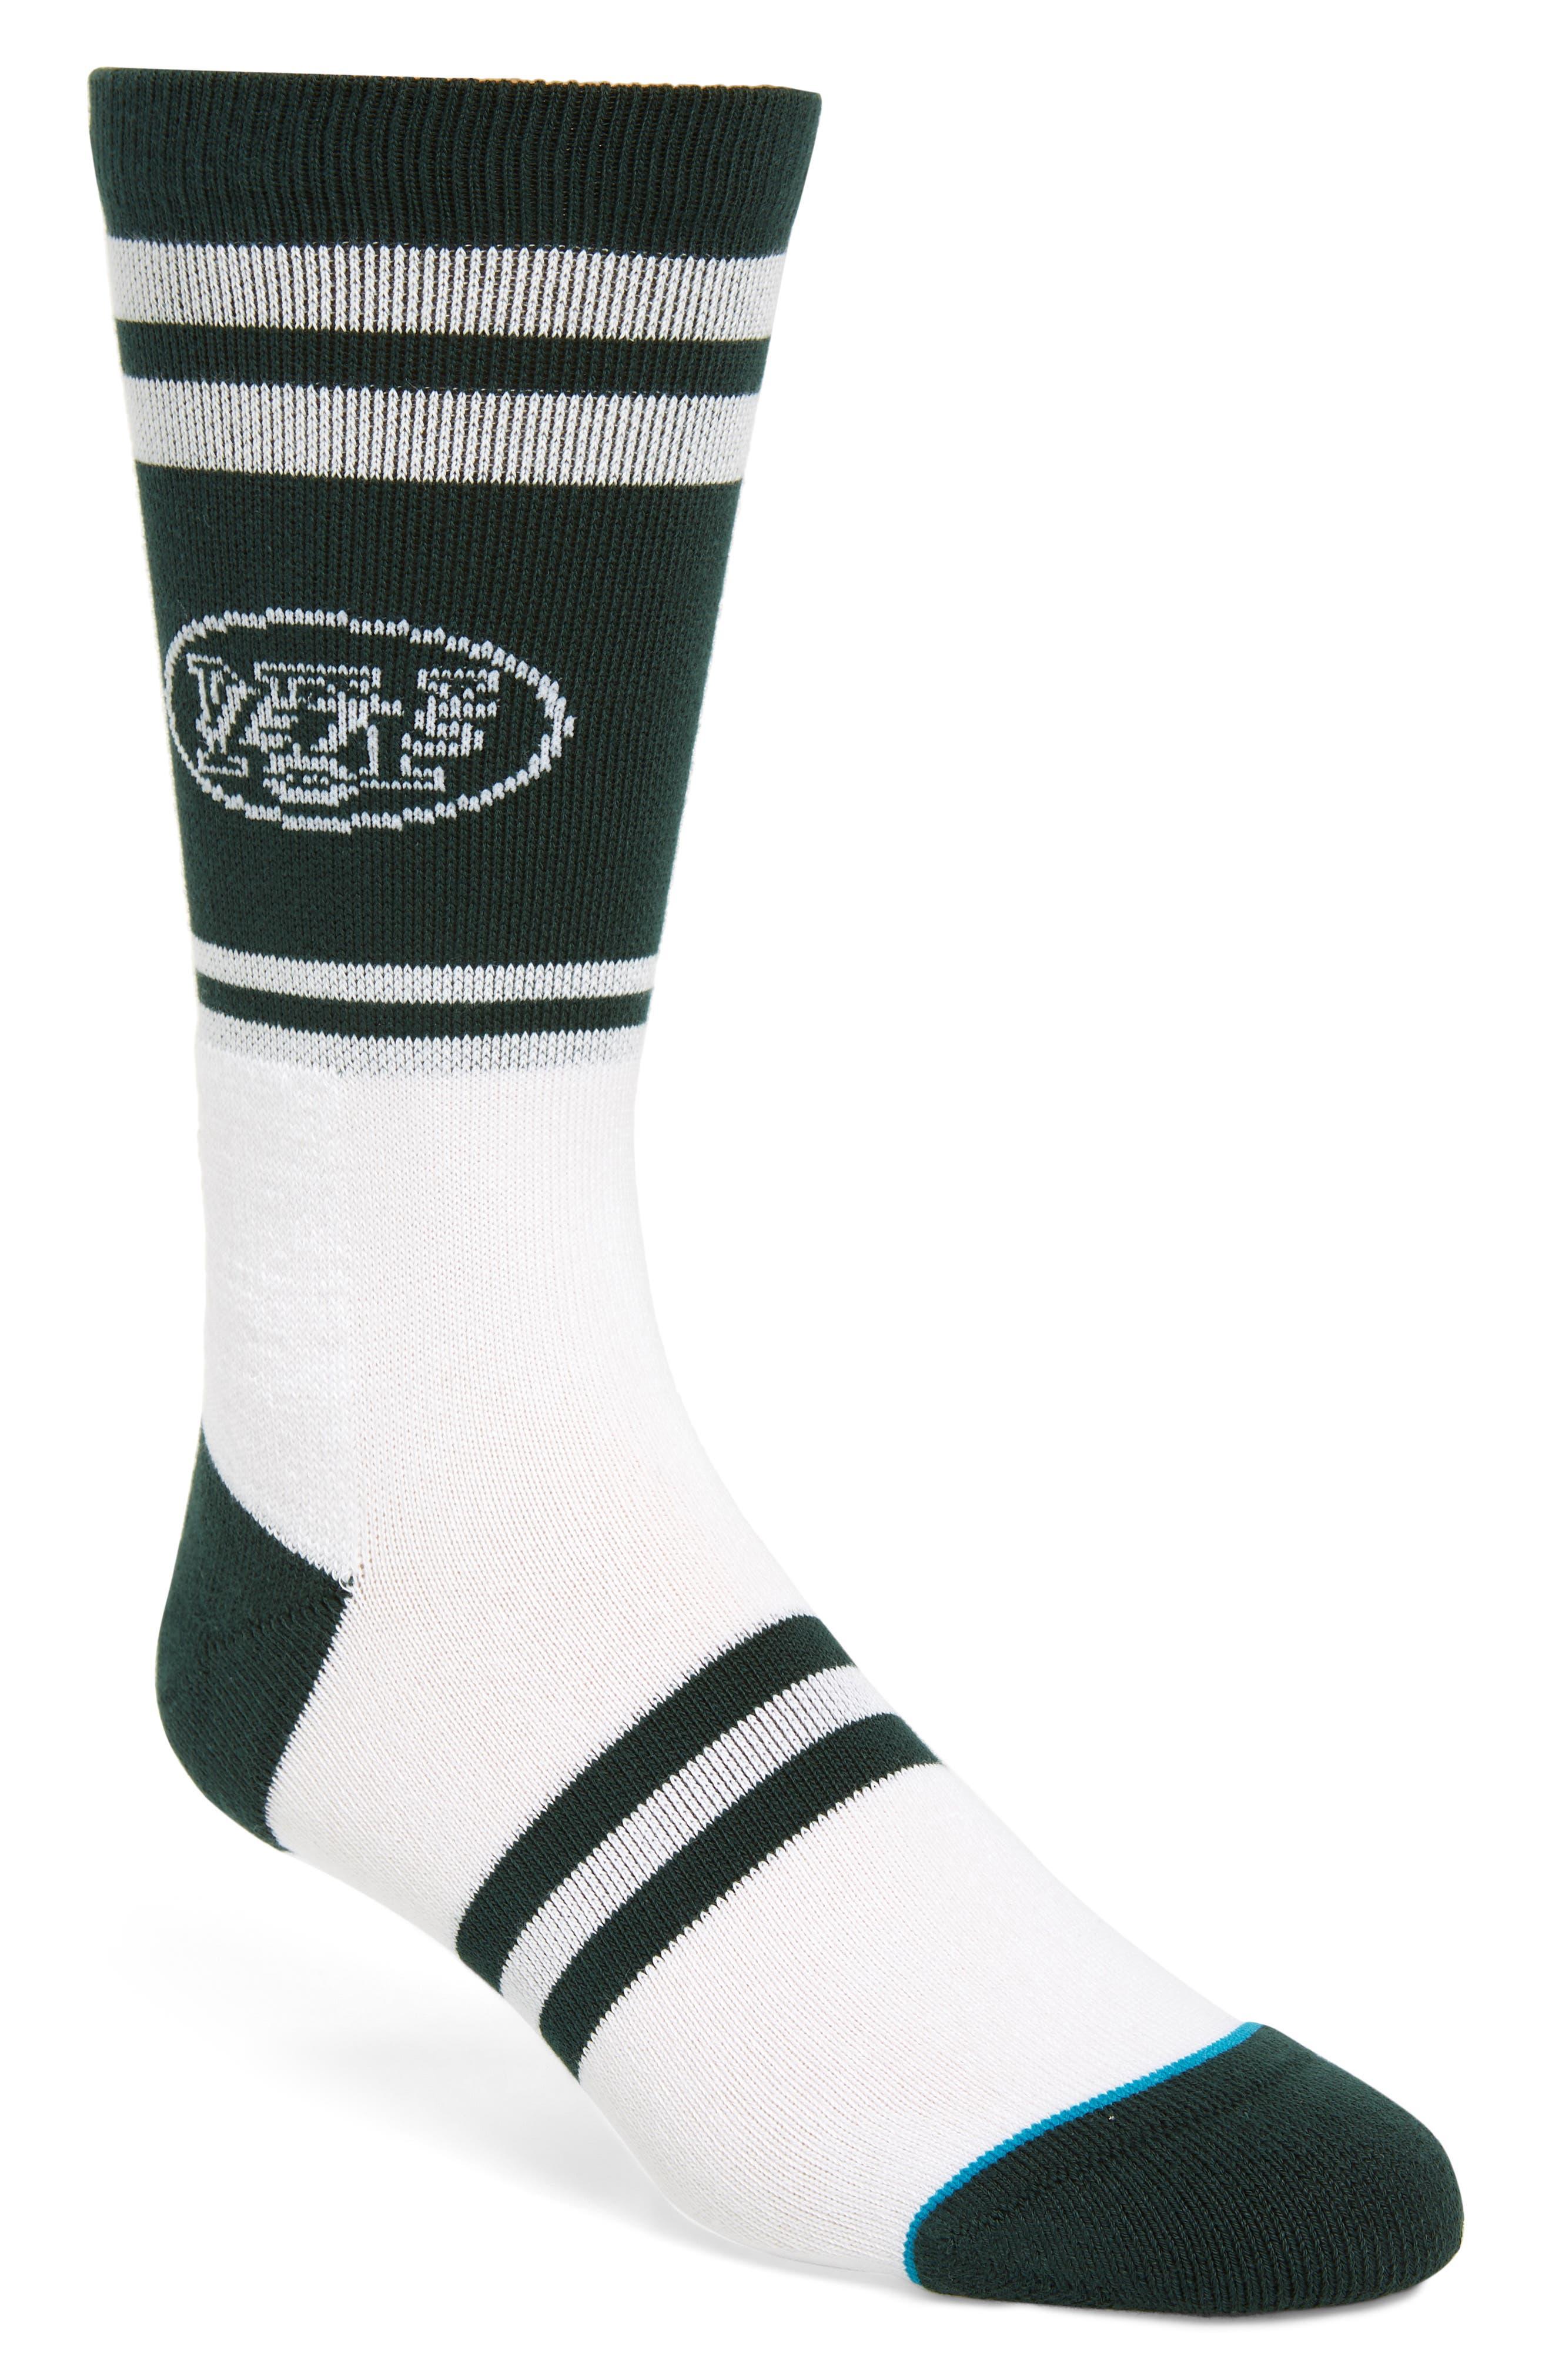 New York Jets Socks,                             Main thumbnail 1, color,                             GREEN